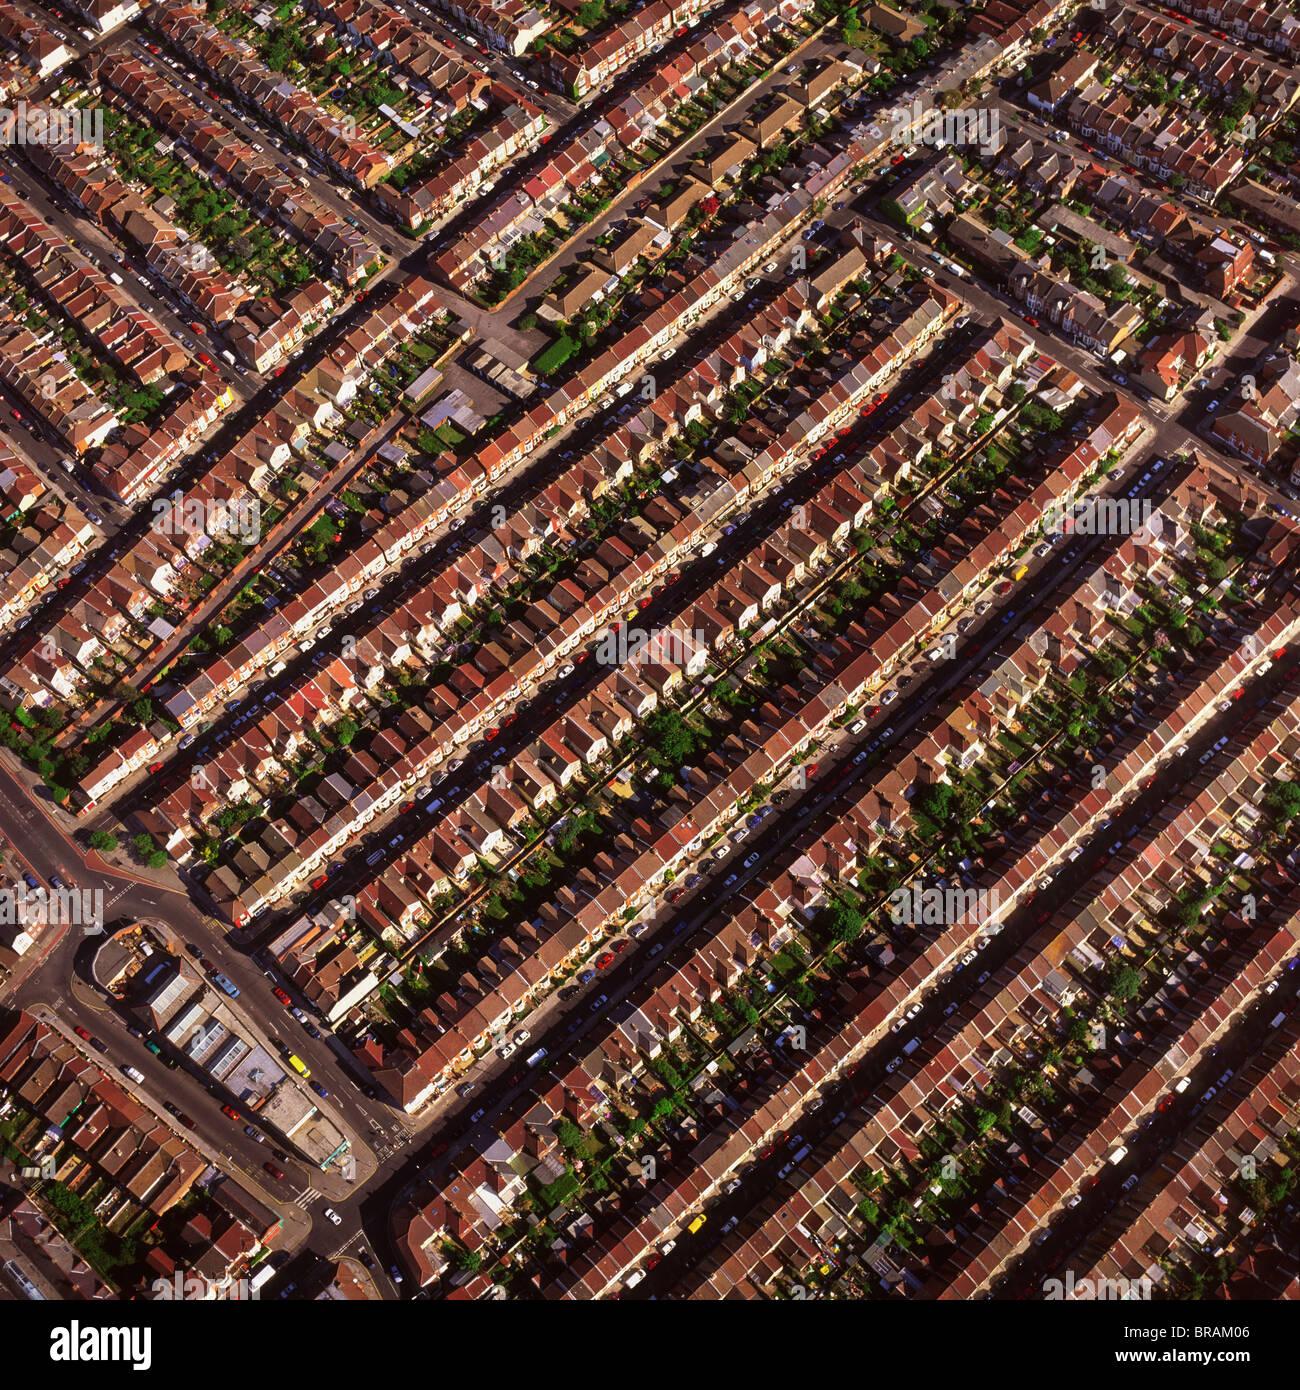 Imagen aérea de viviendas adosadas, Portsmouth, Hampshire, Inglaterra, Reino Unido, Europa Imagen De Stock